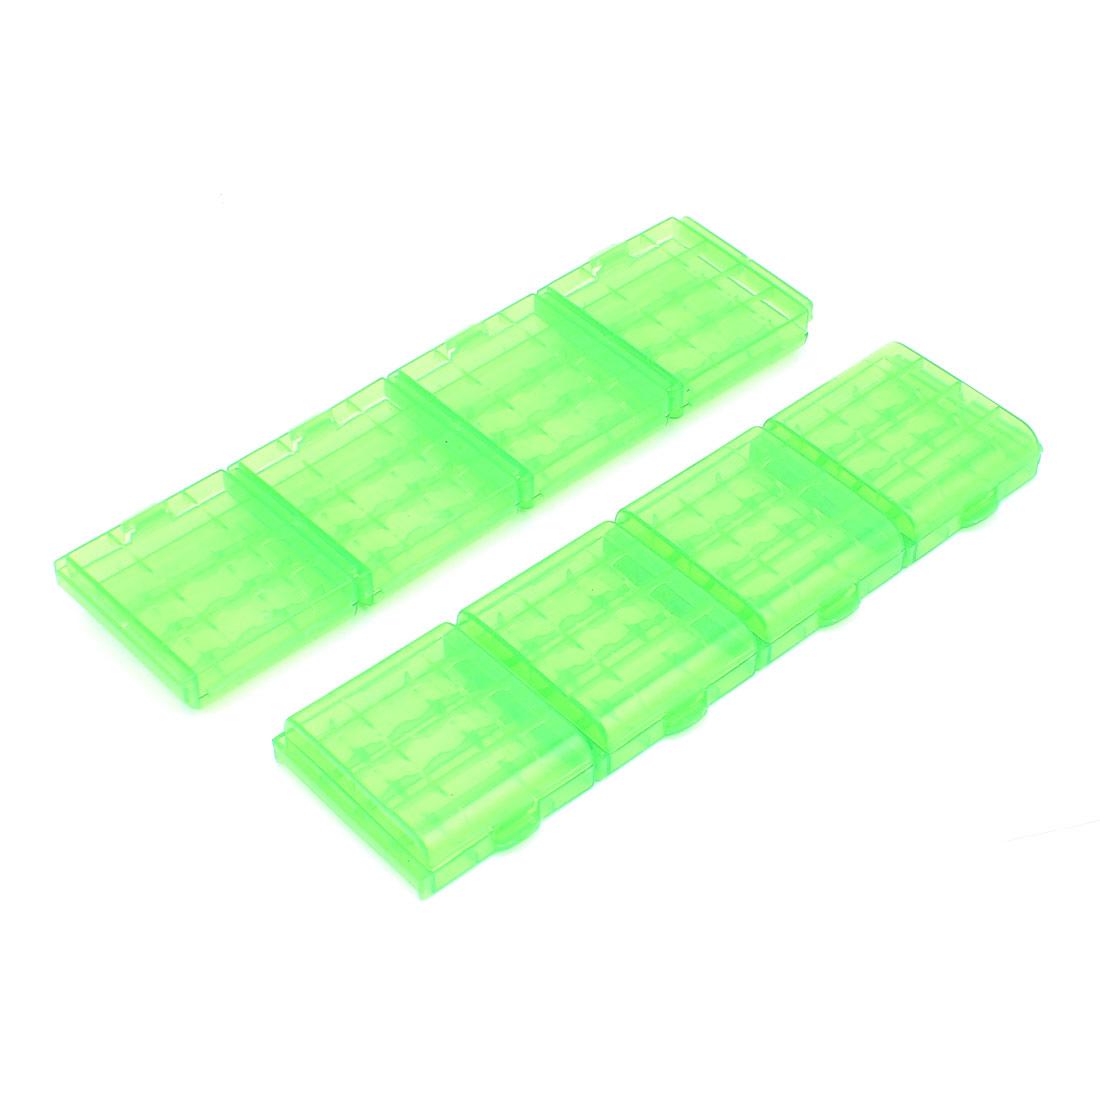 8PCS Plastic Portable Case Holder Storage Box Green for 4 x 1.5V AA Batteries